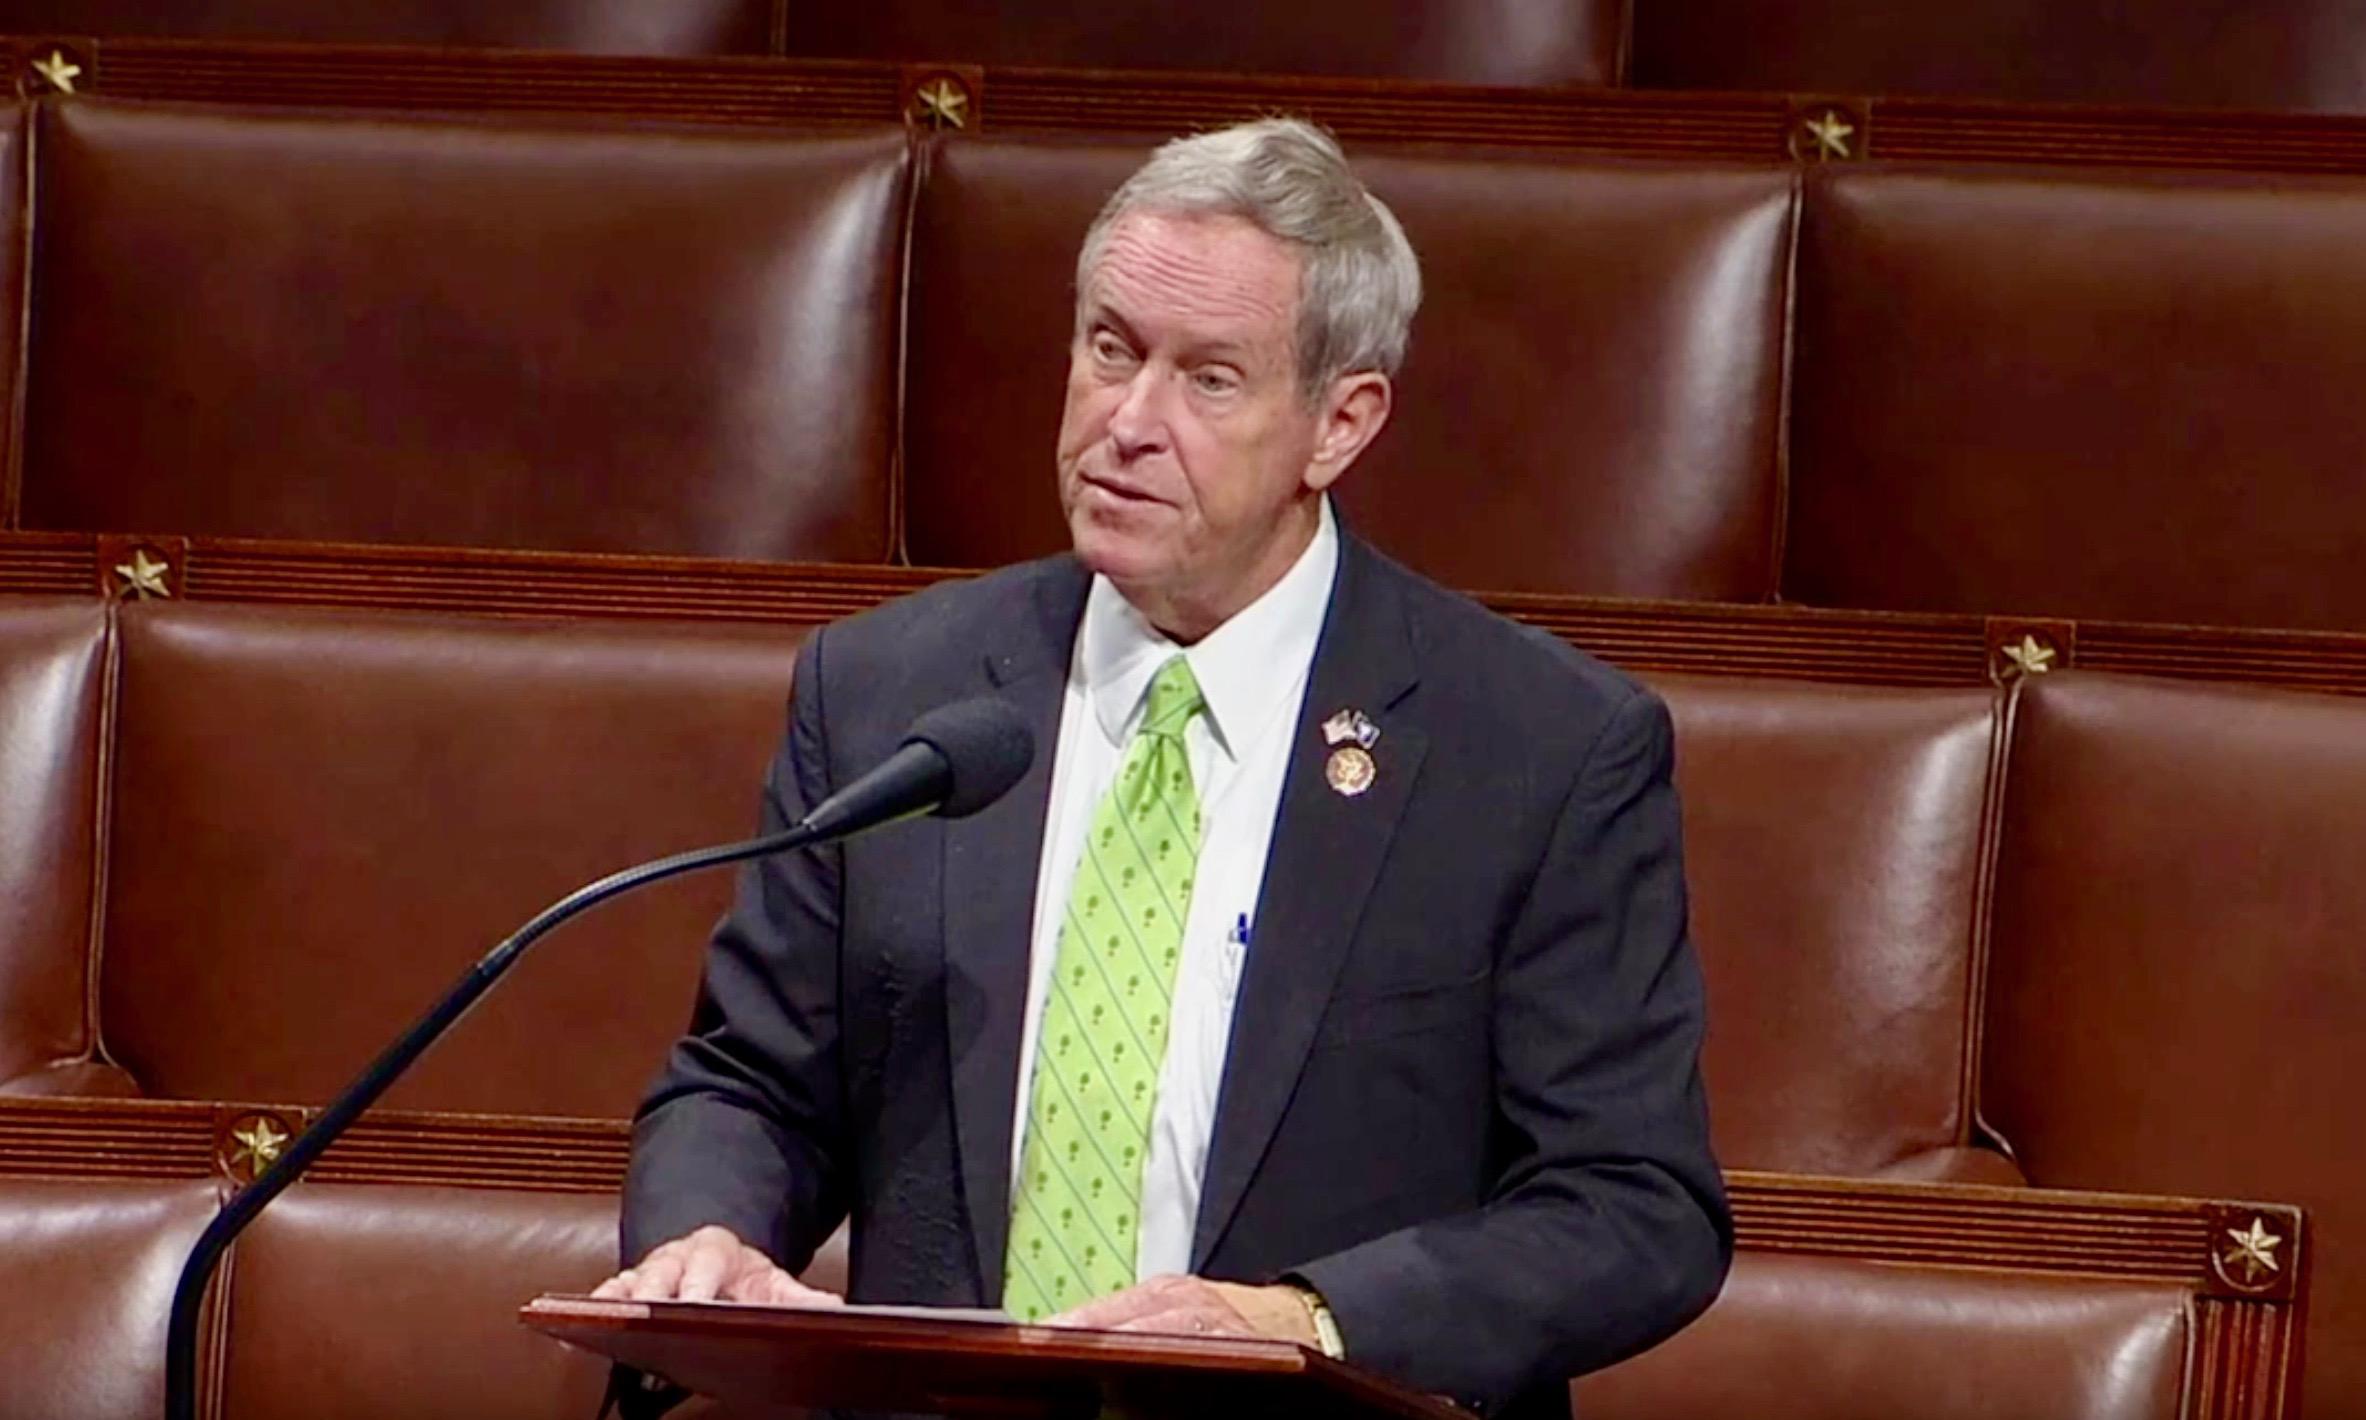 FITSNews – Joe Wilson Slams House Democrats Over Military Widow Bill